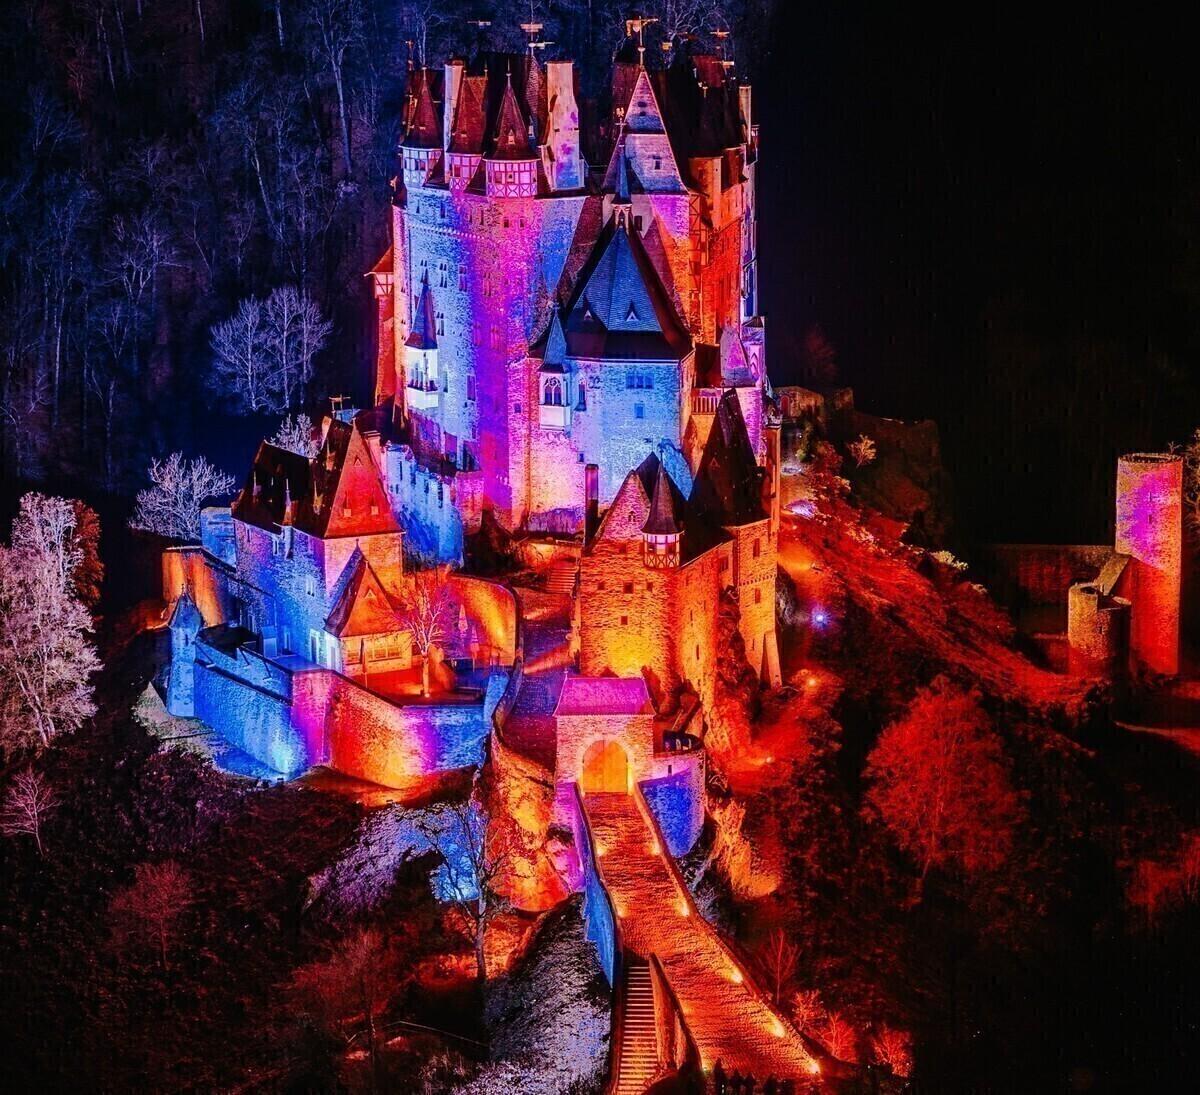 Medieval castle Burg Eltz beautifully illuminated